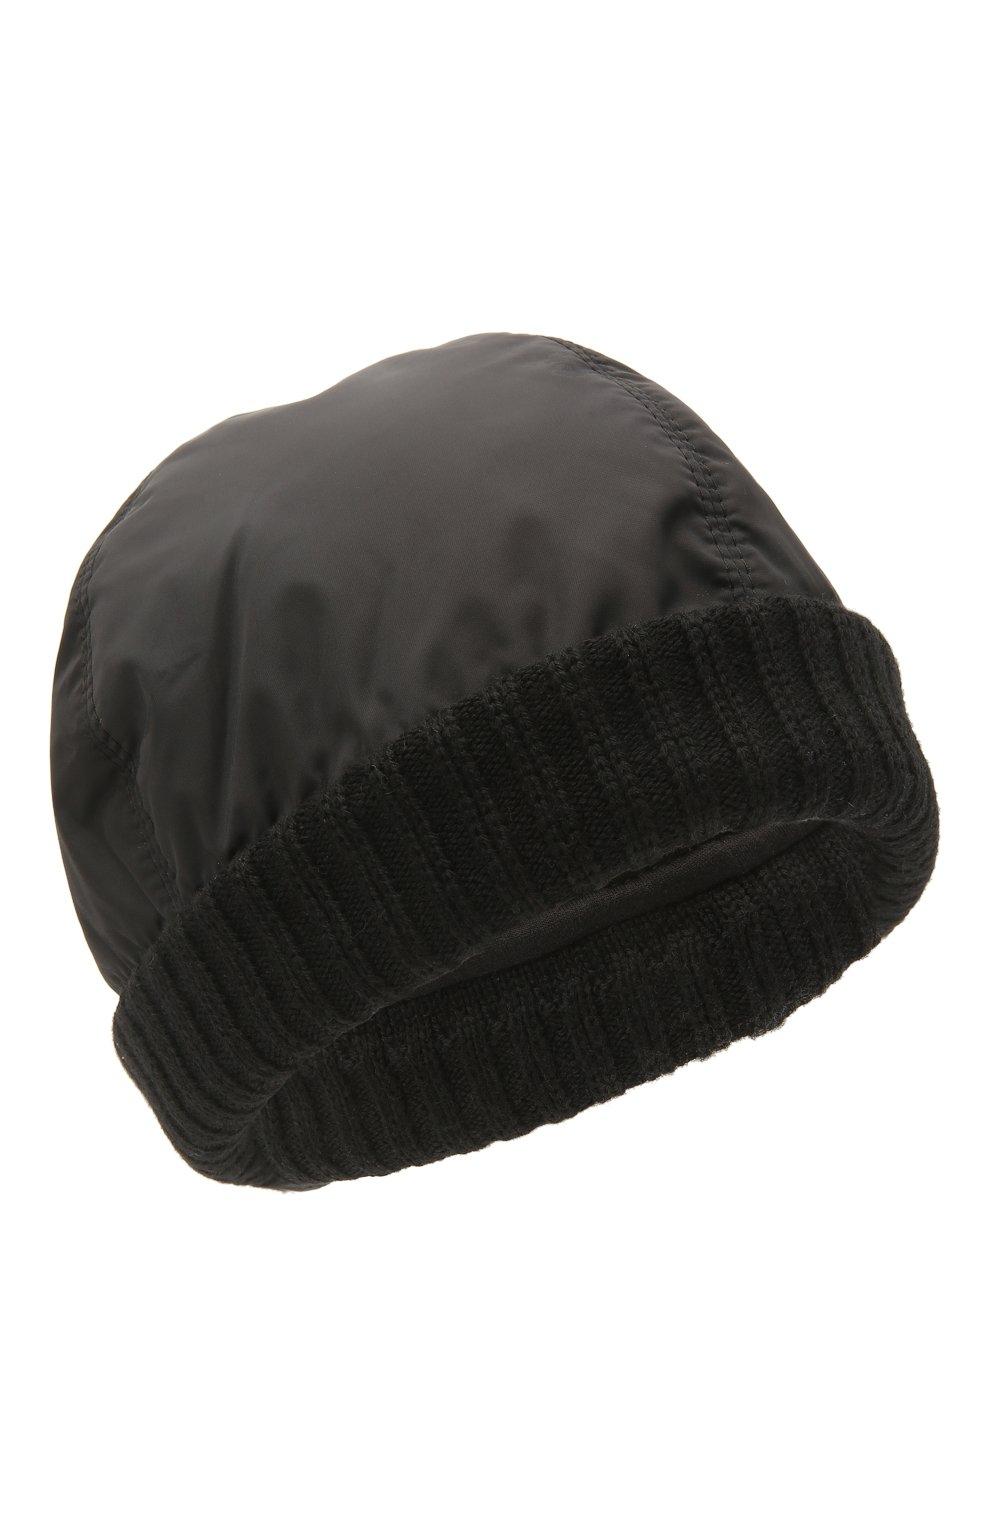 Мужская утепленная шапка Z ZEGNA черного цвета, арт. Z2I74H/B2W | Фото 1 (Материал: Текстиль; Кросс-КТ: Трикотаж)